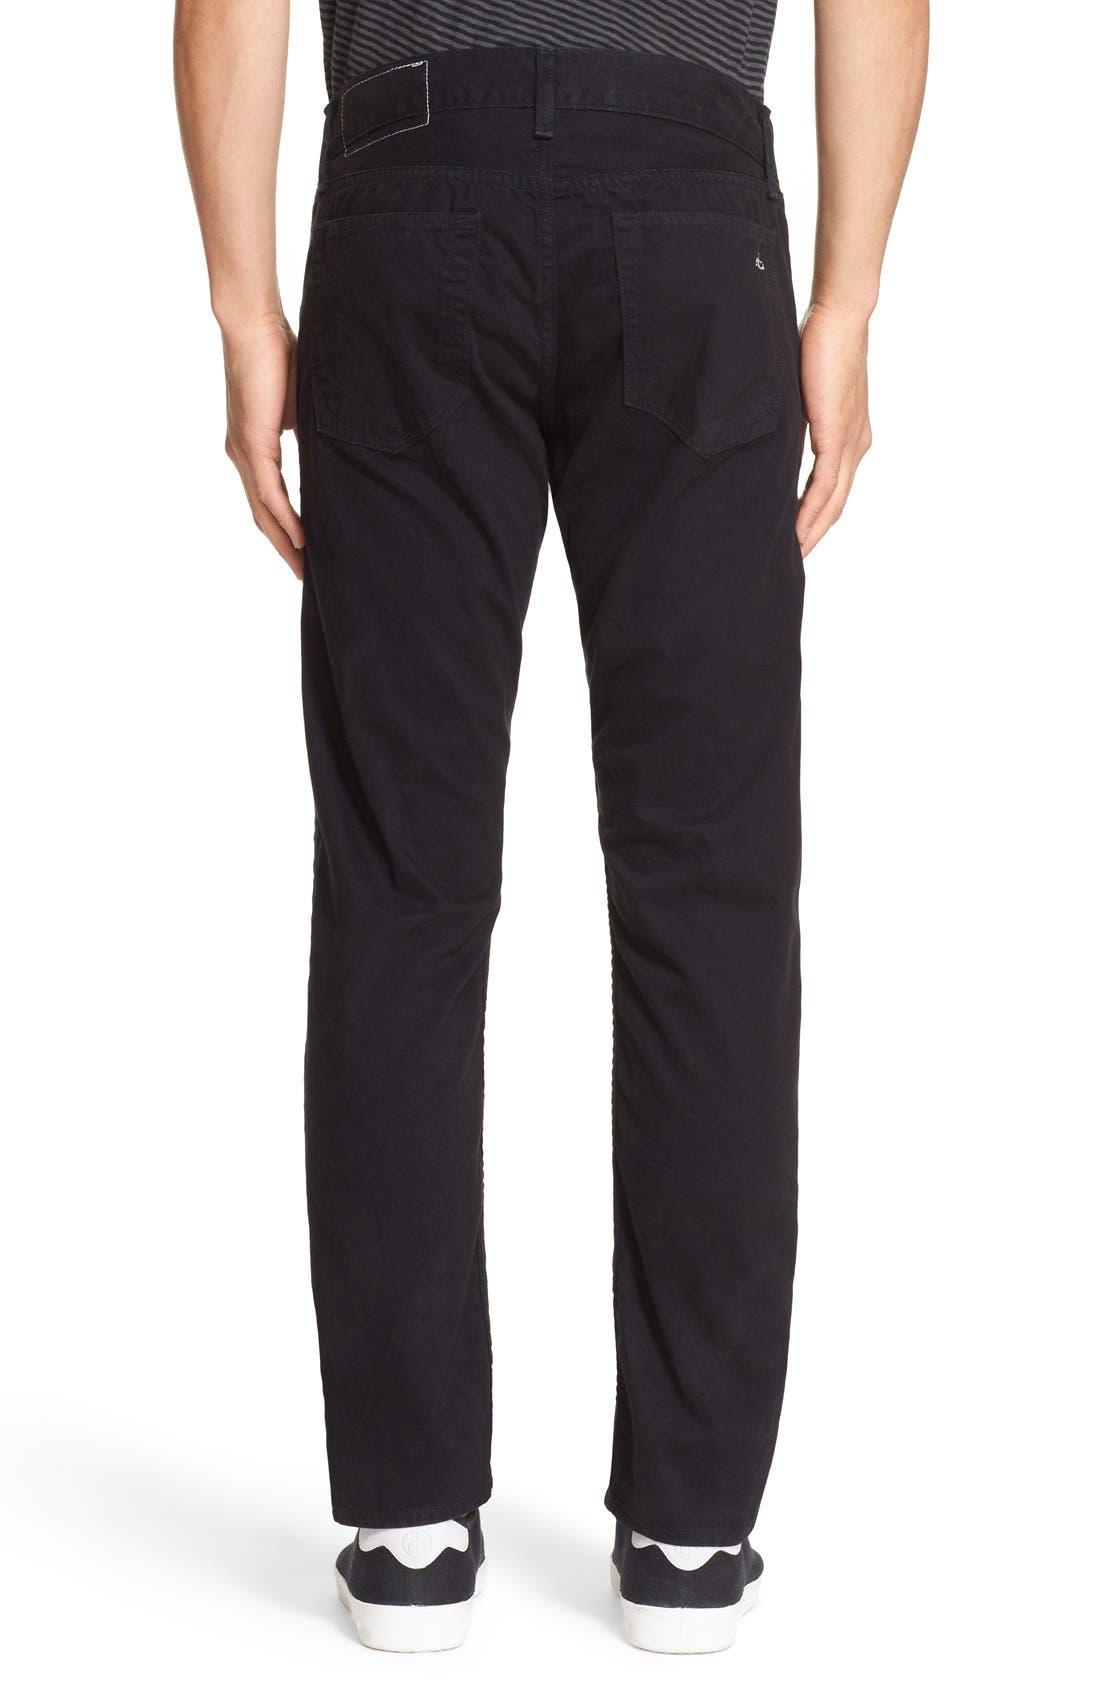 'Fit 2' Cotton Twill Pants,                             Alternate thumbnail 2, color,                             Black